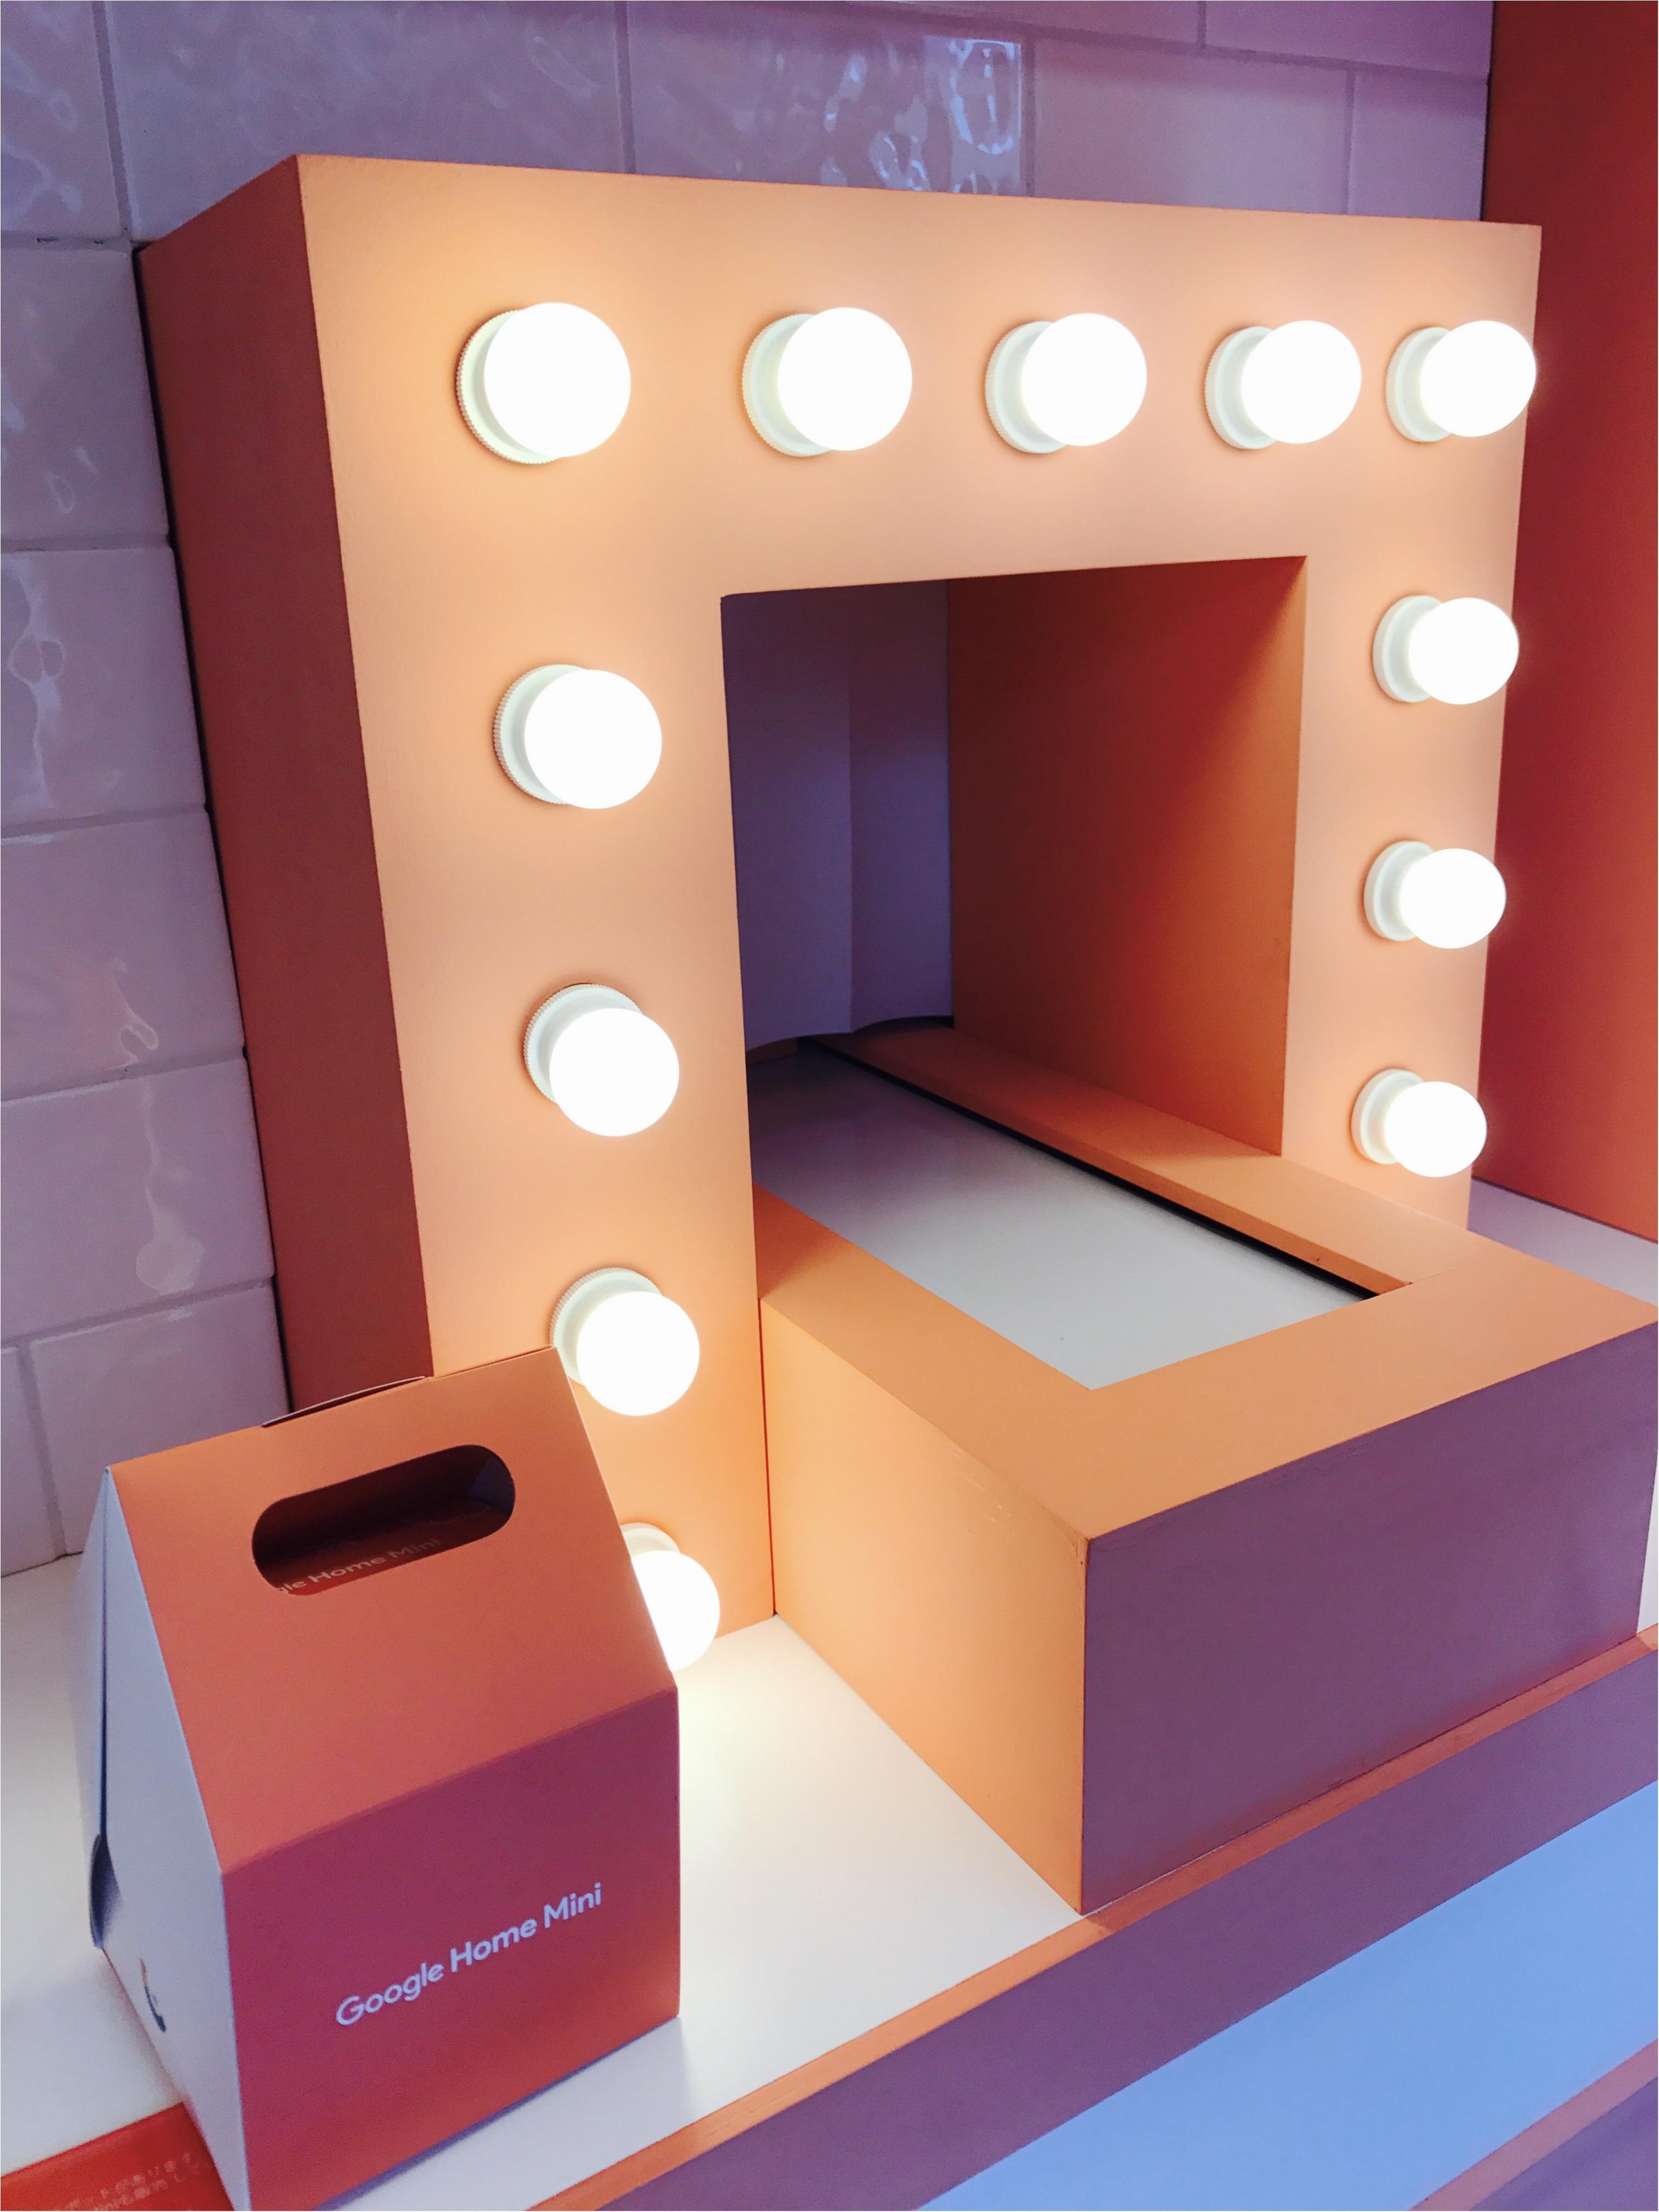 【Google Home Mini ドーナツショップ】《無料!》でドーナツもらえちゃいます!!運が良かったら本物の「Google Home Mini」が当たるかも!?_5